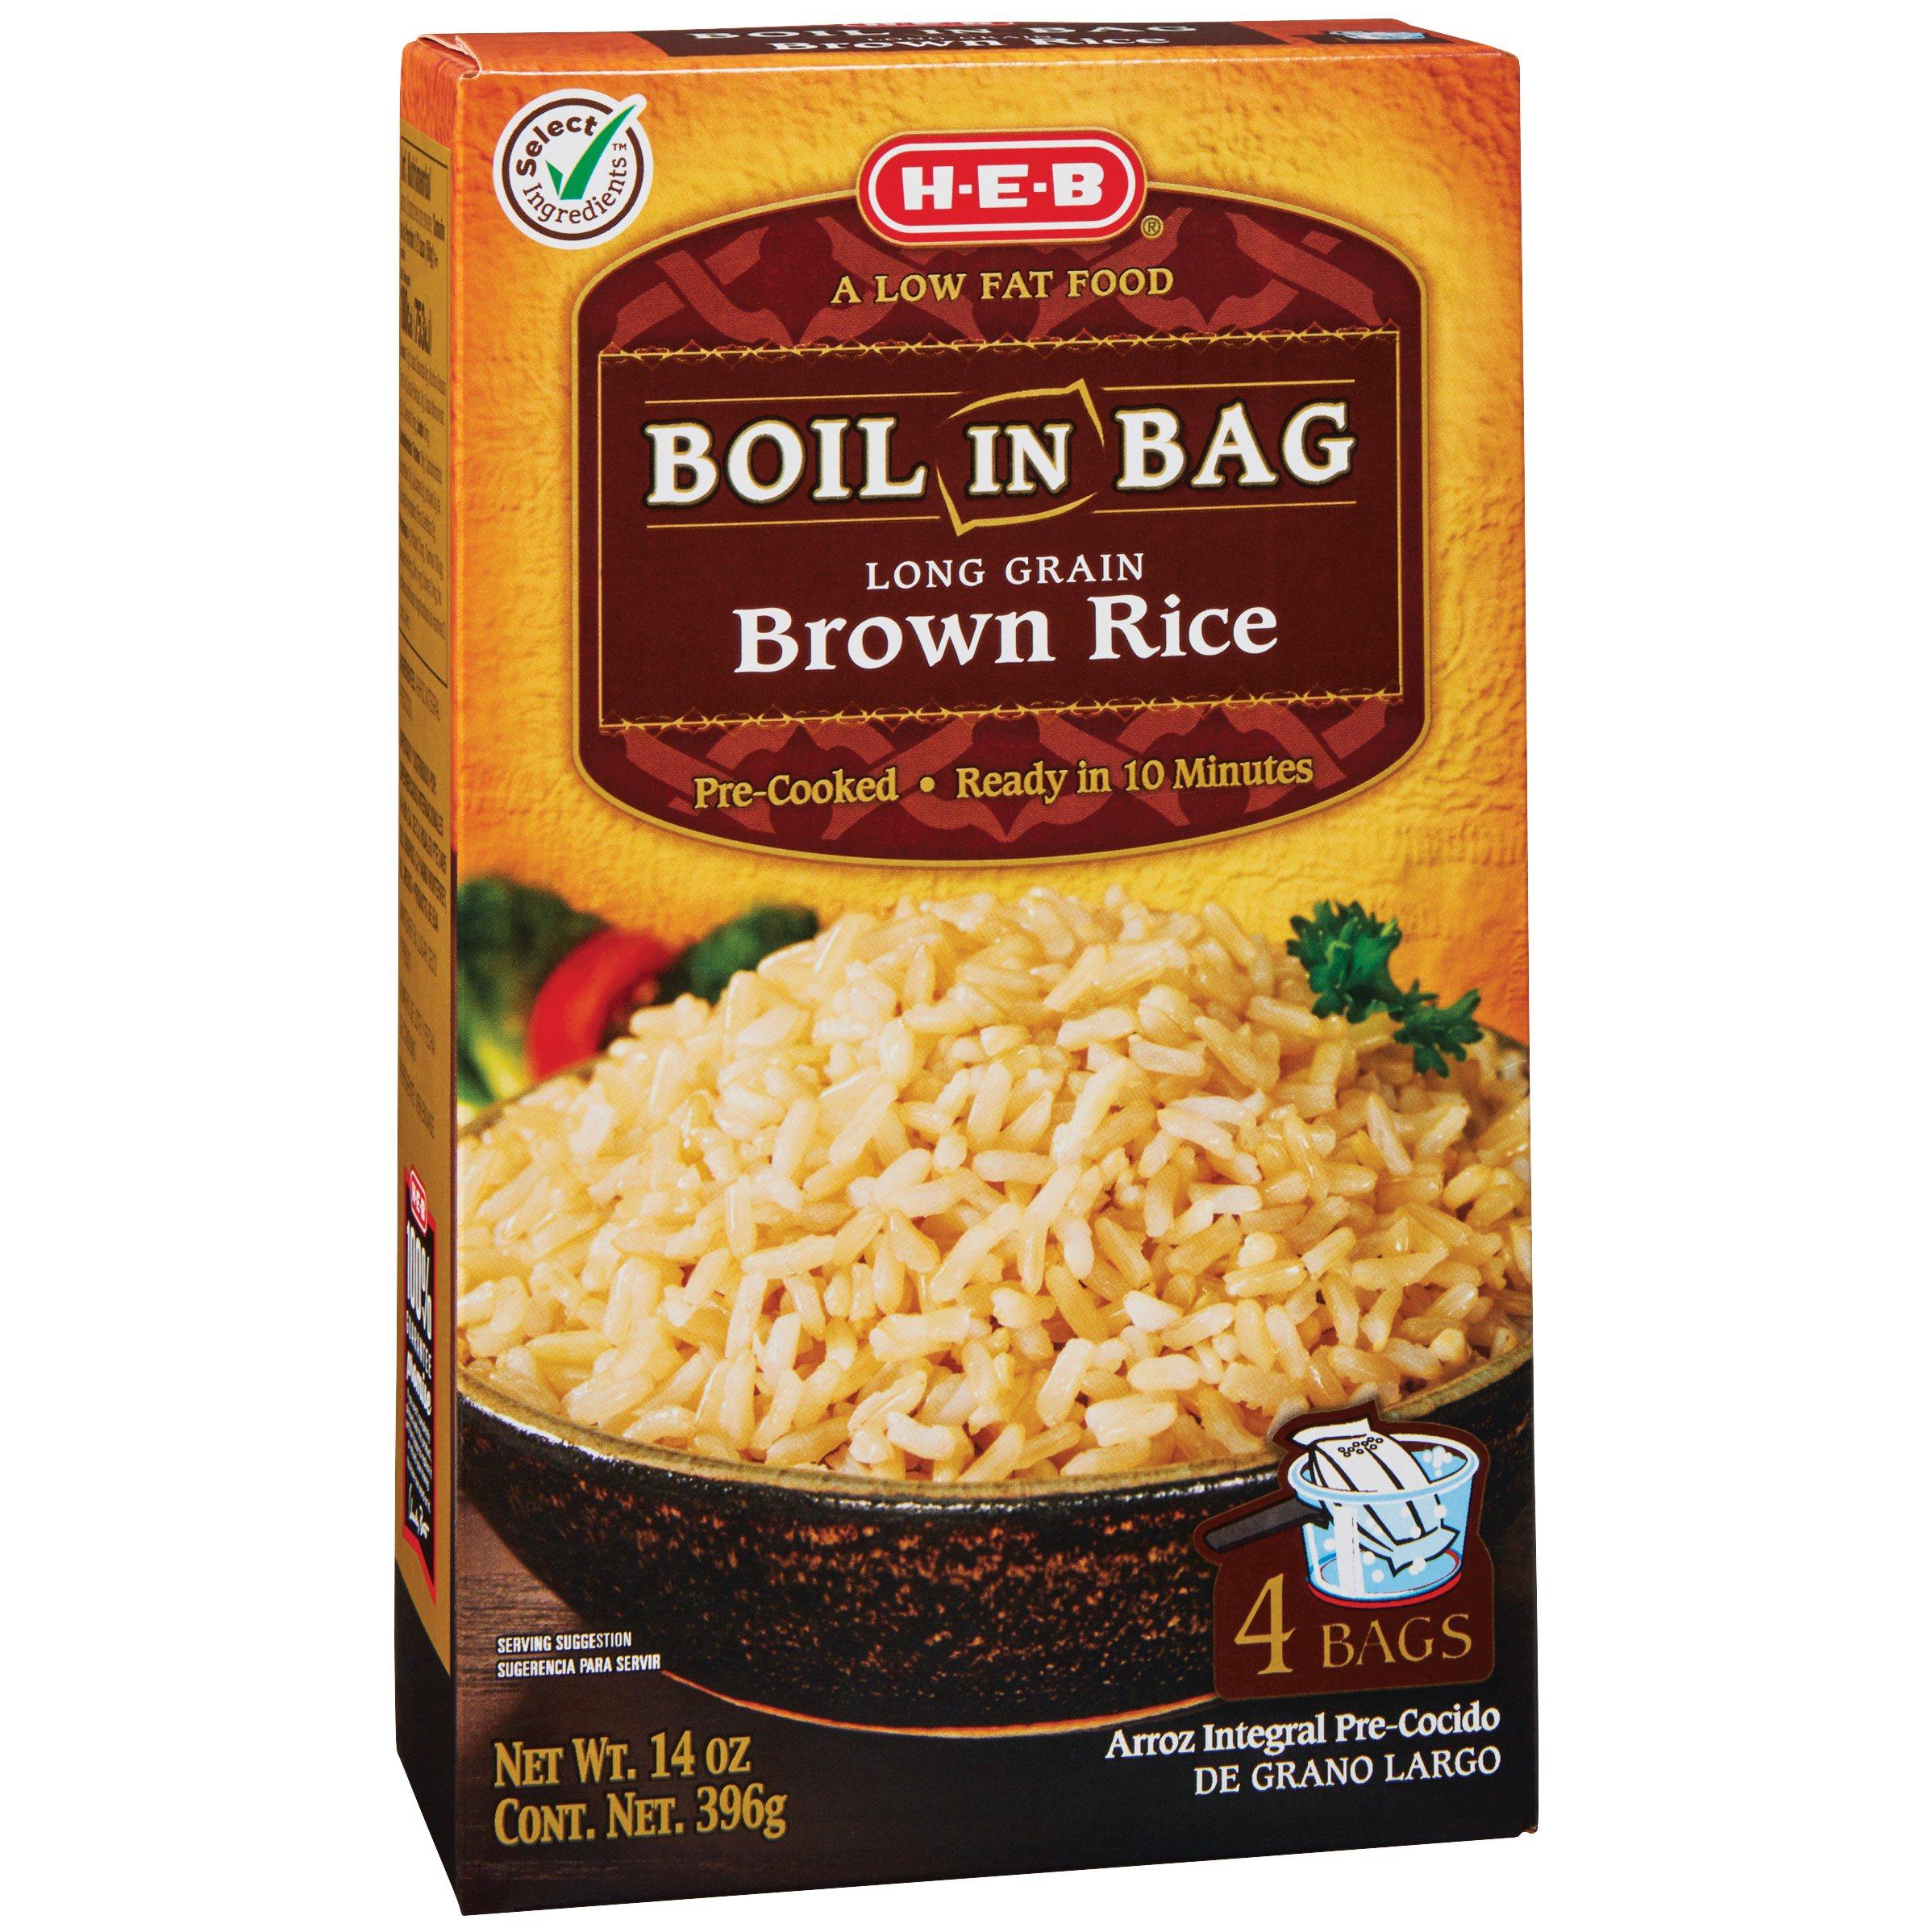 Heb Boil In Bag Long Grain Brown Rice Shop Rice Grains At Heb